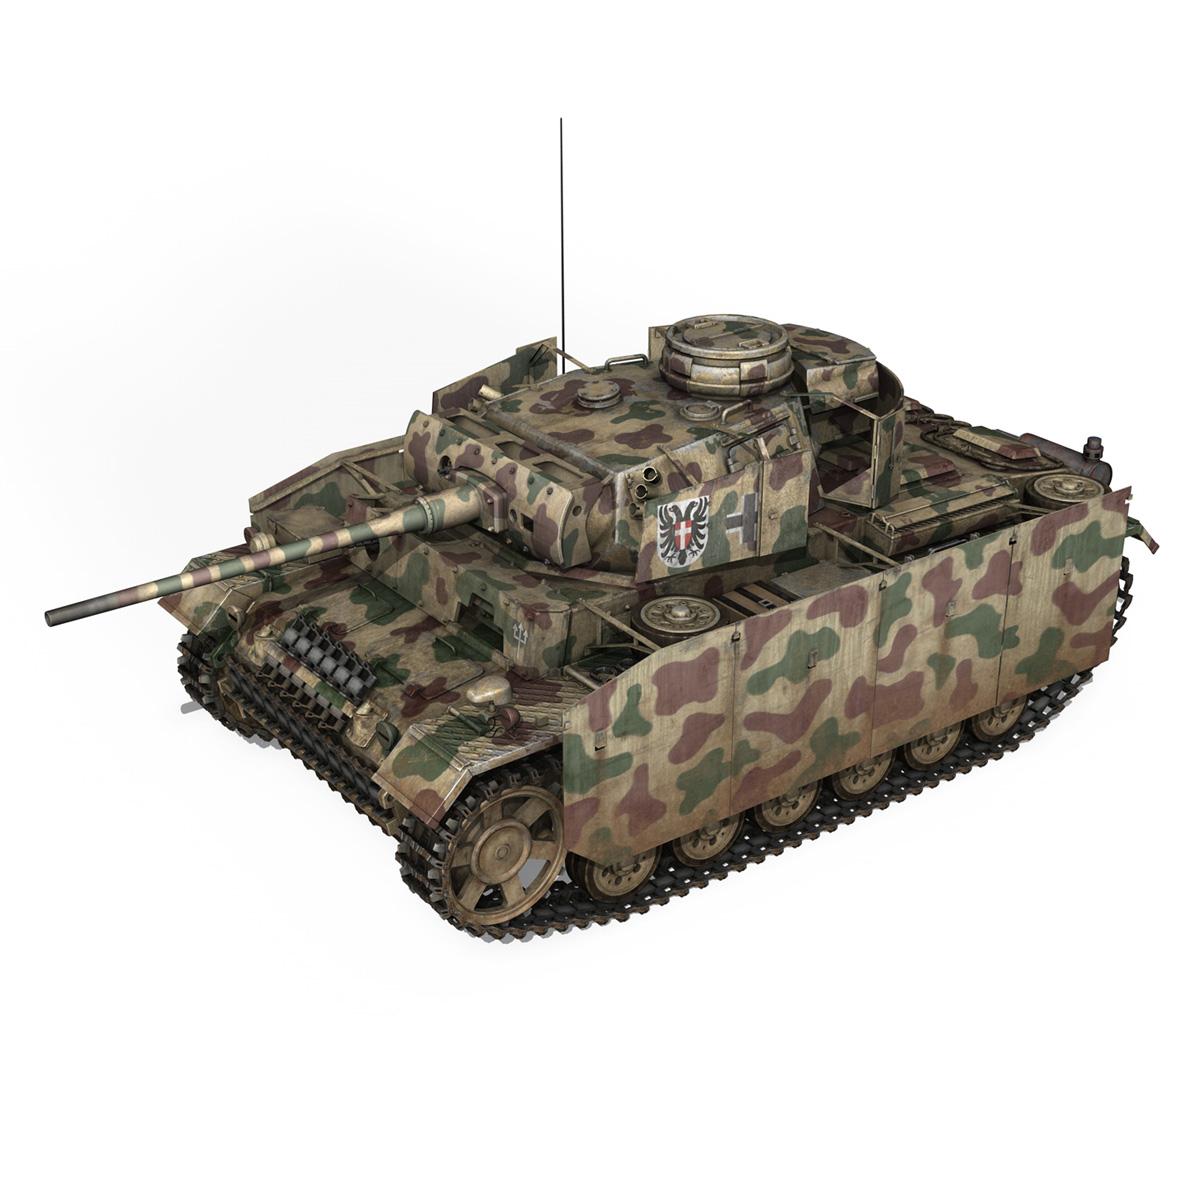 pzkpfw iii – panzer 3 – ausf.m – 413 3d model 3ds c4d lwo obj 269366